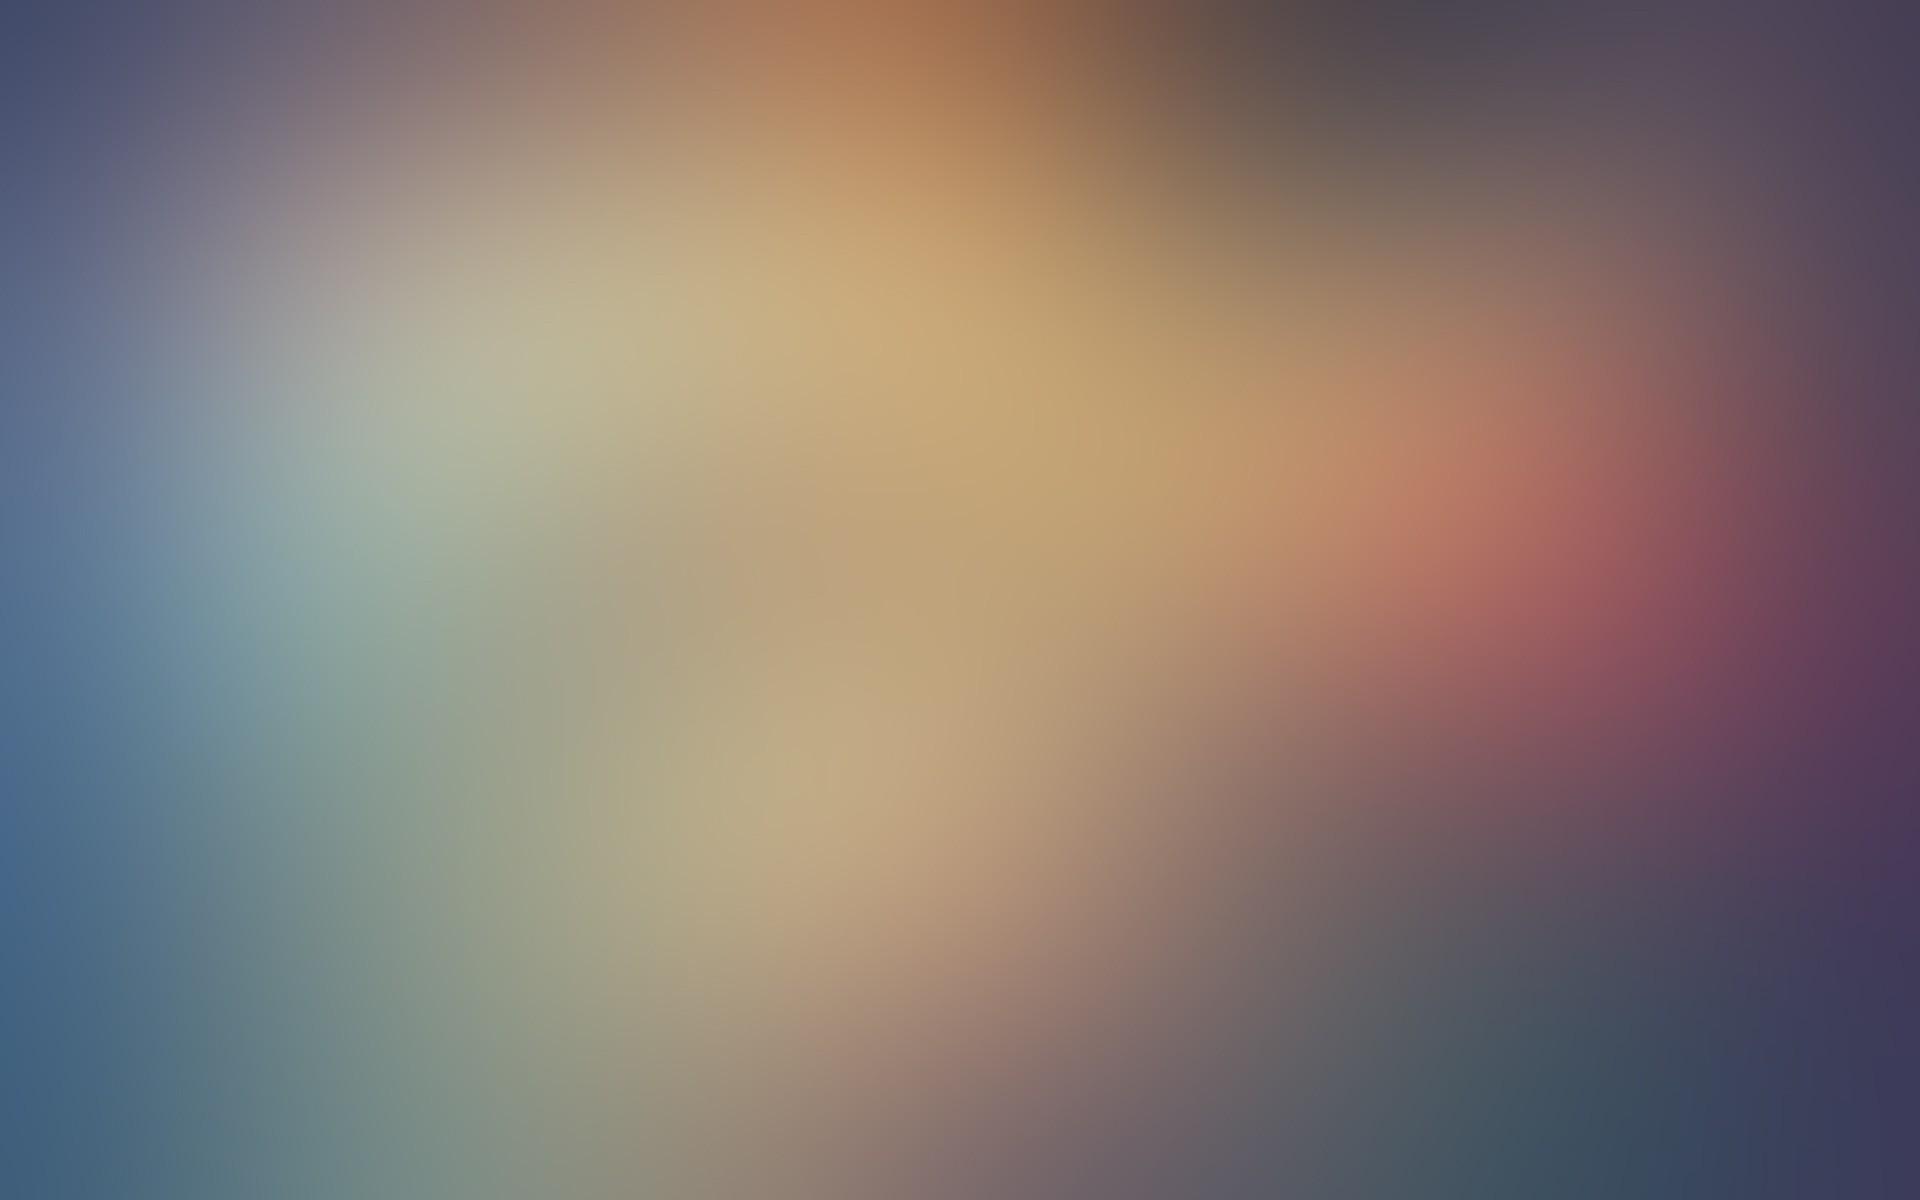 Stunning Blur Image